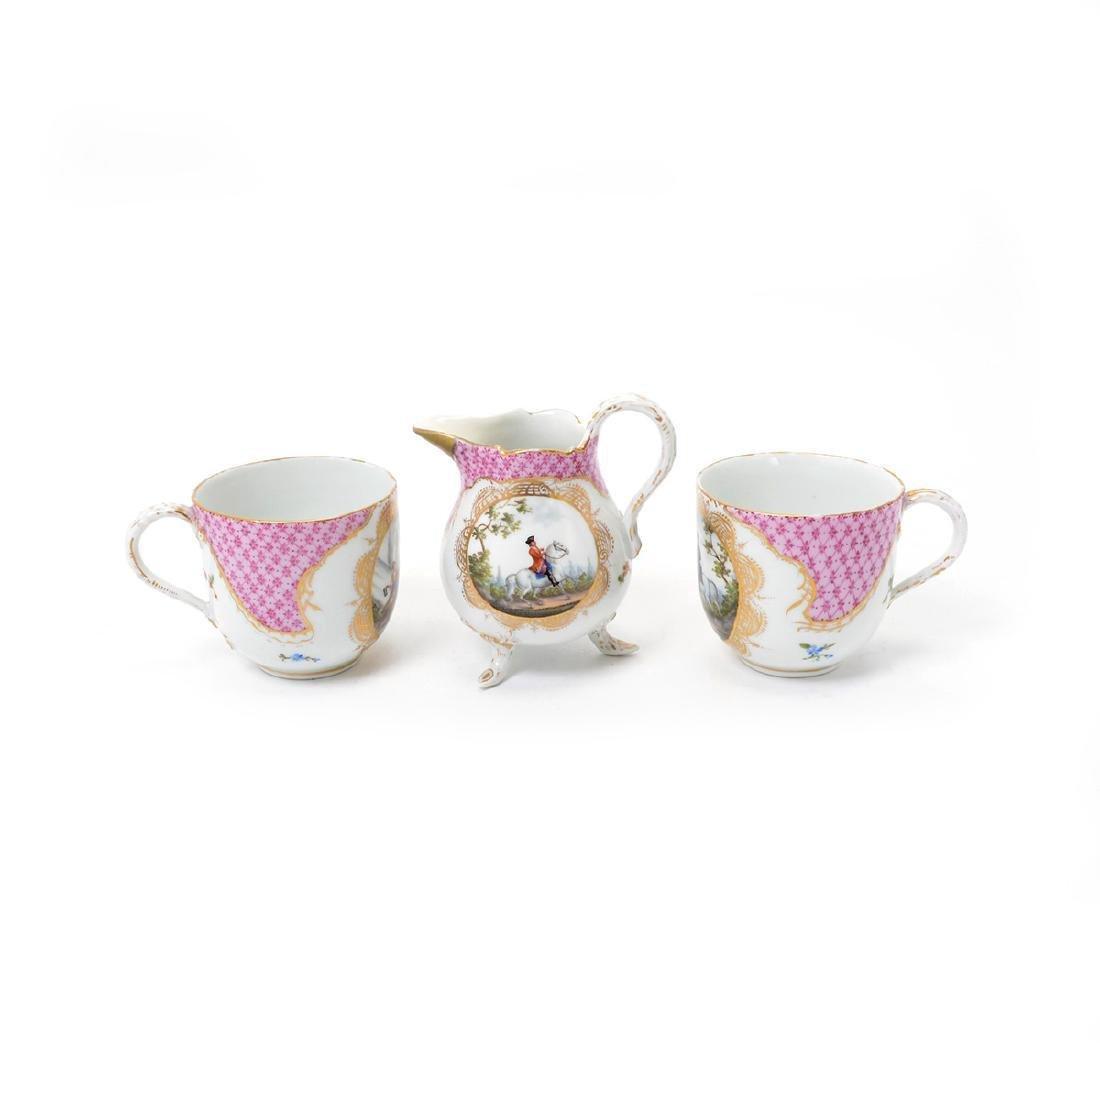 Meissen Six Piece Porcelain Tea Service including Tray - 10